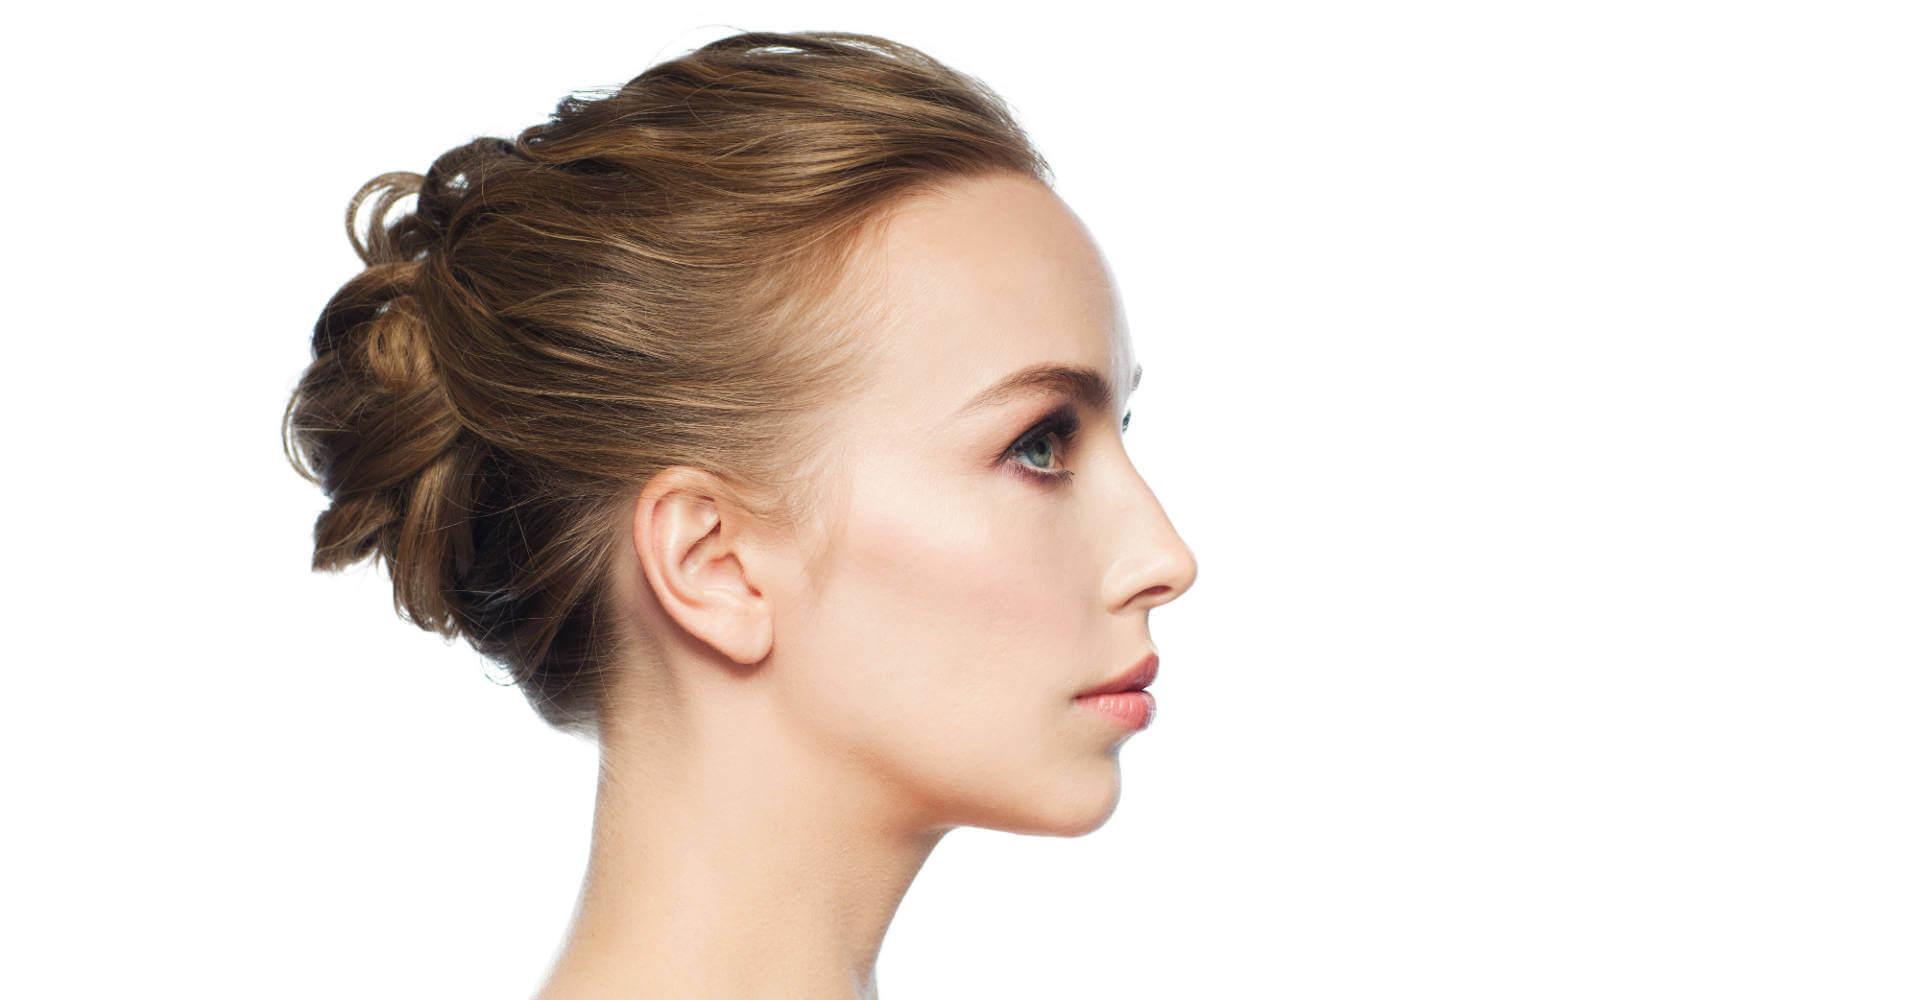 rhinoplastie-chirurgie-du-nez